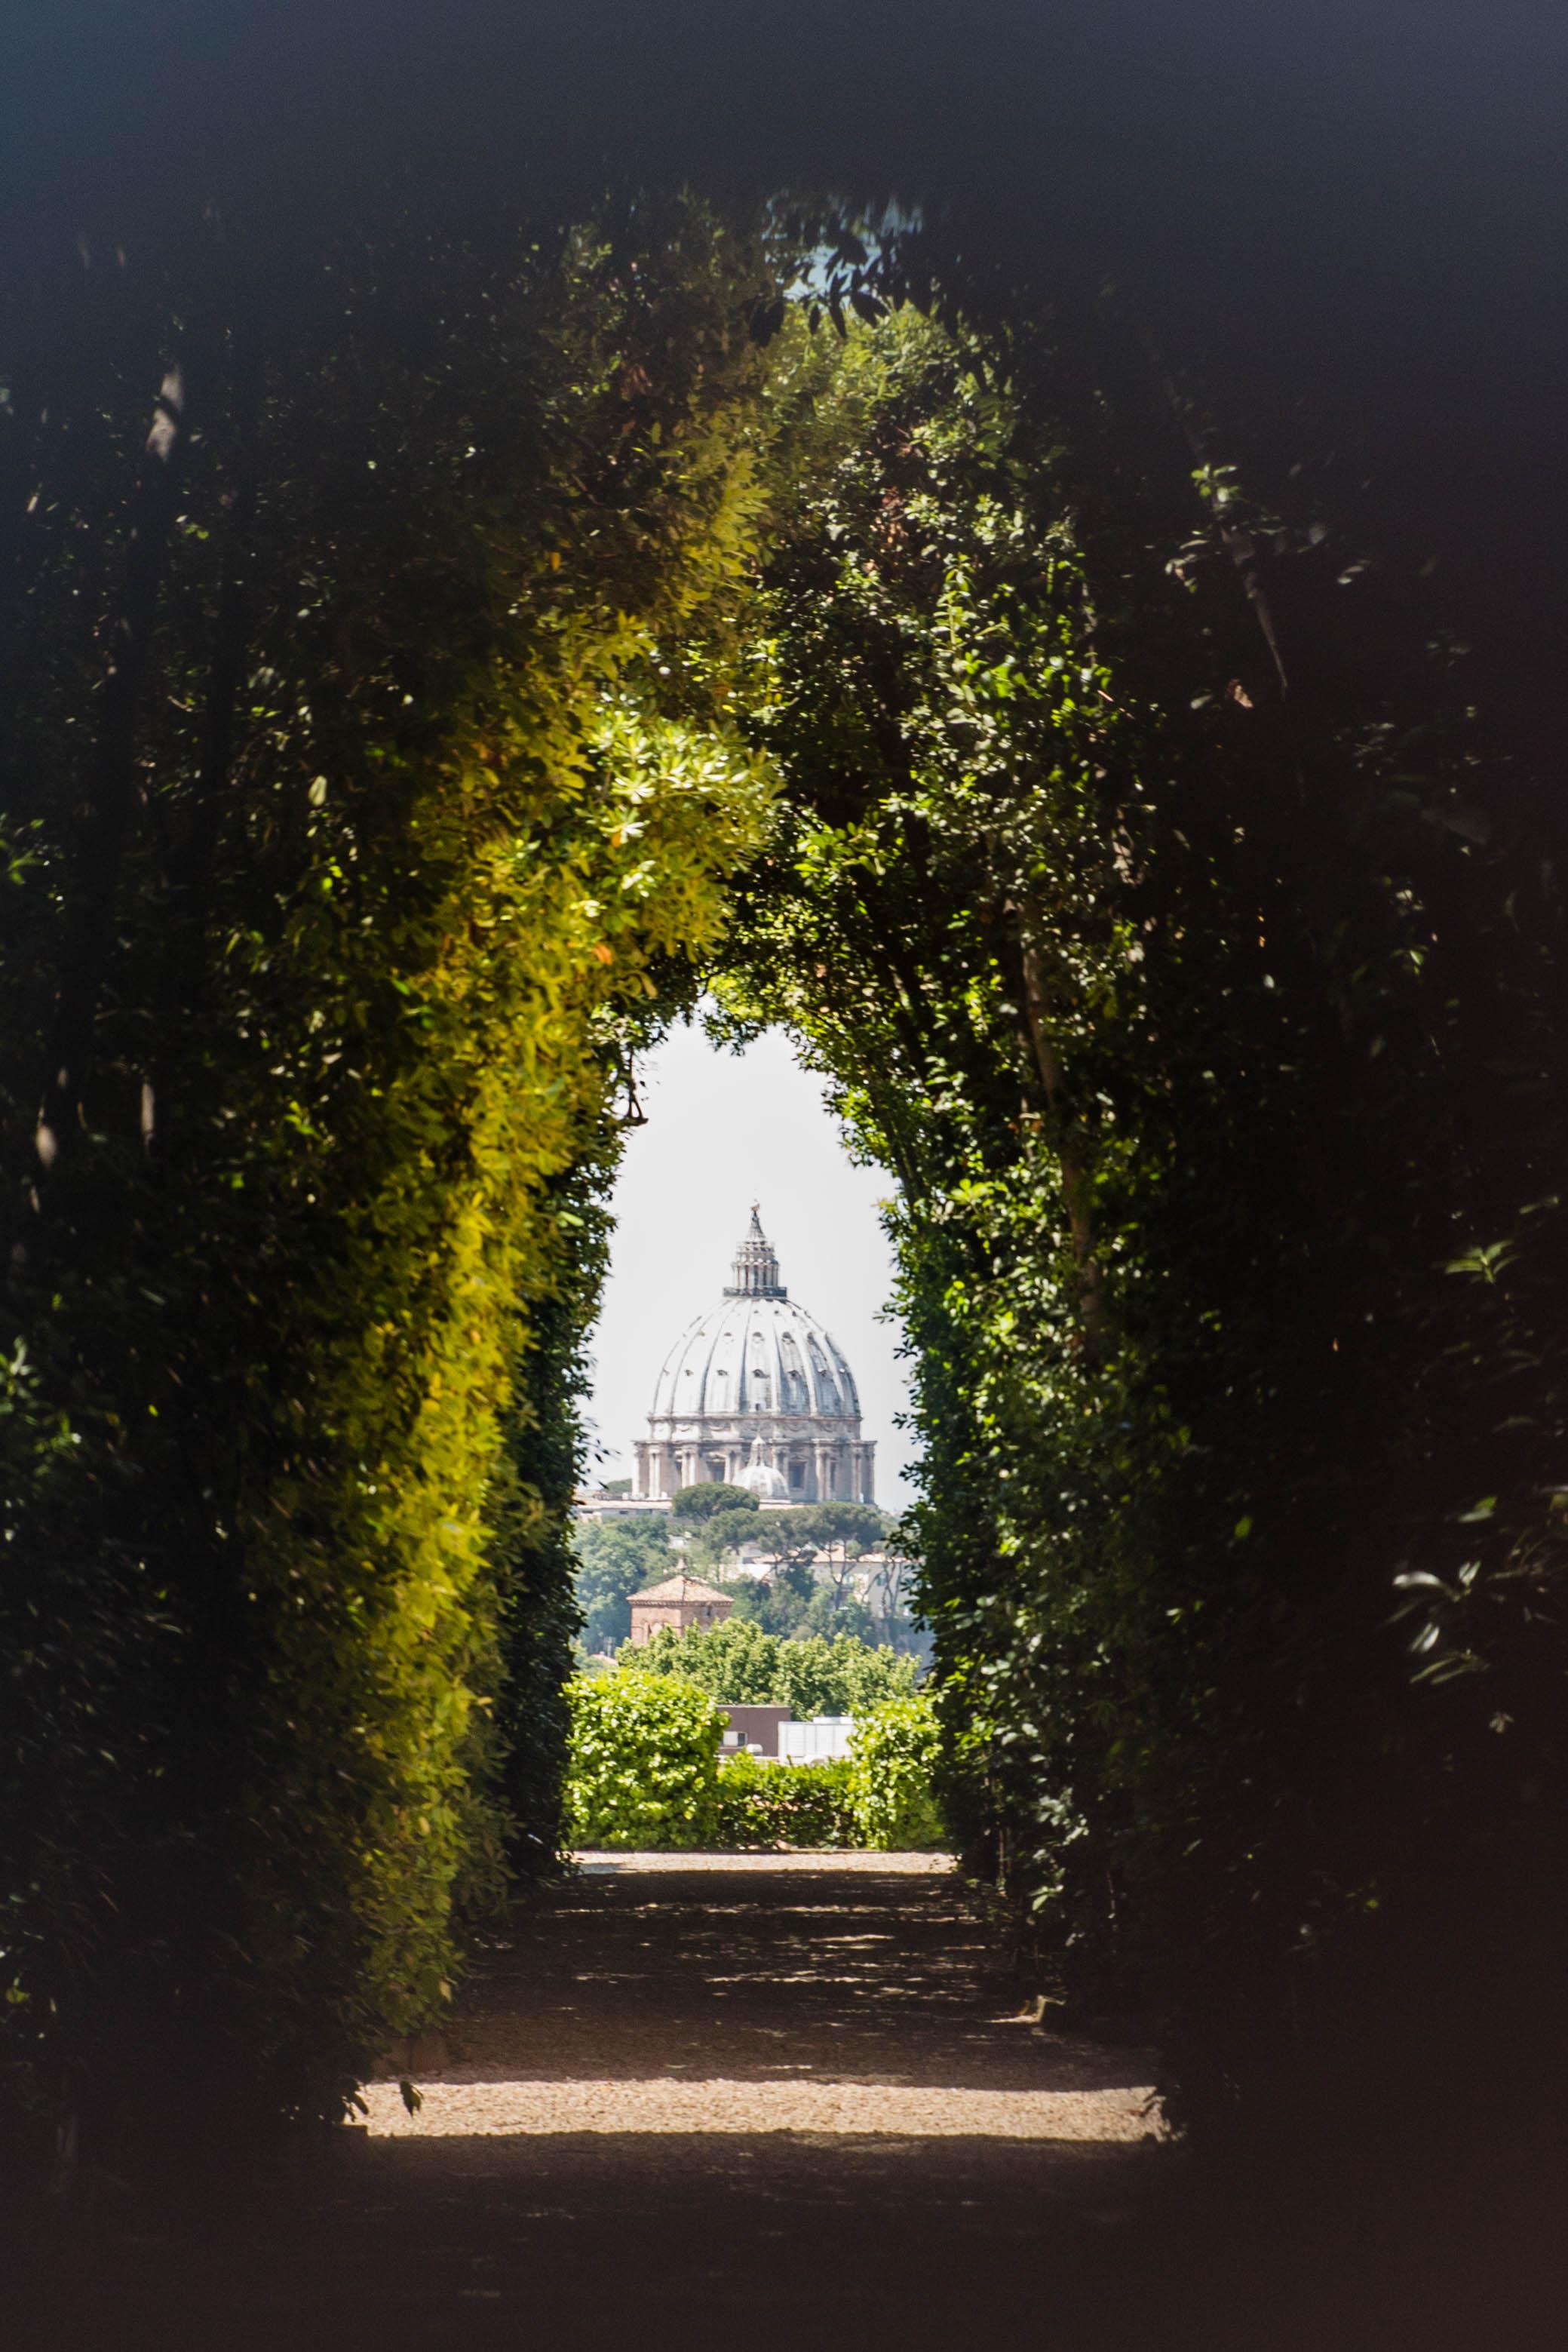 The Secret Keyhole, Aventine Hill, Rome Italy